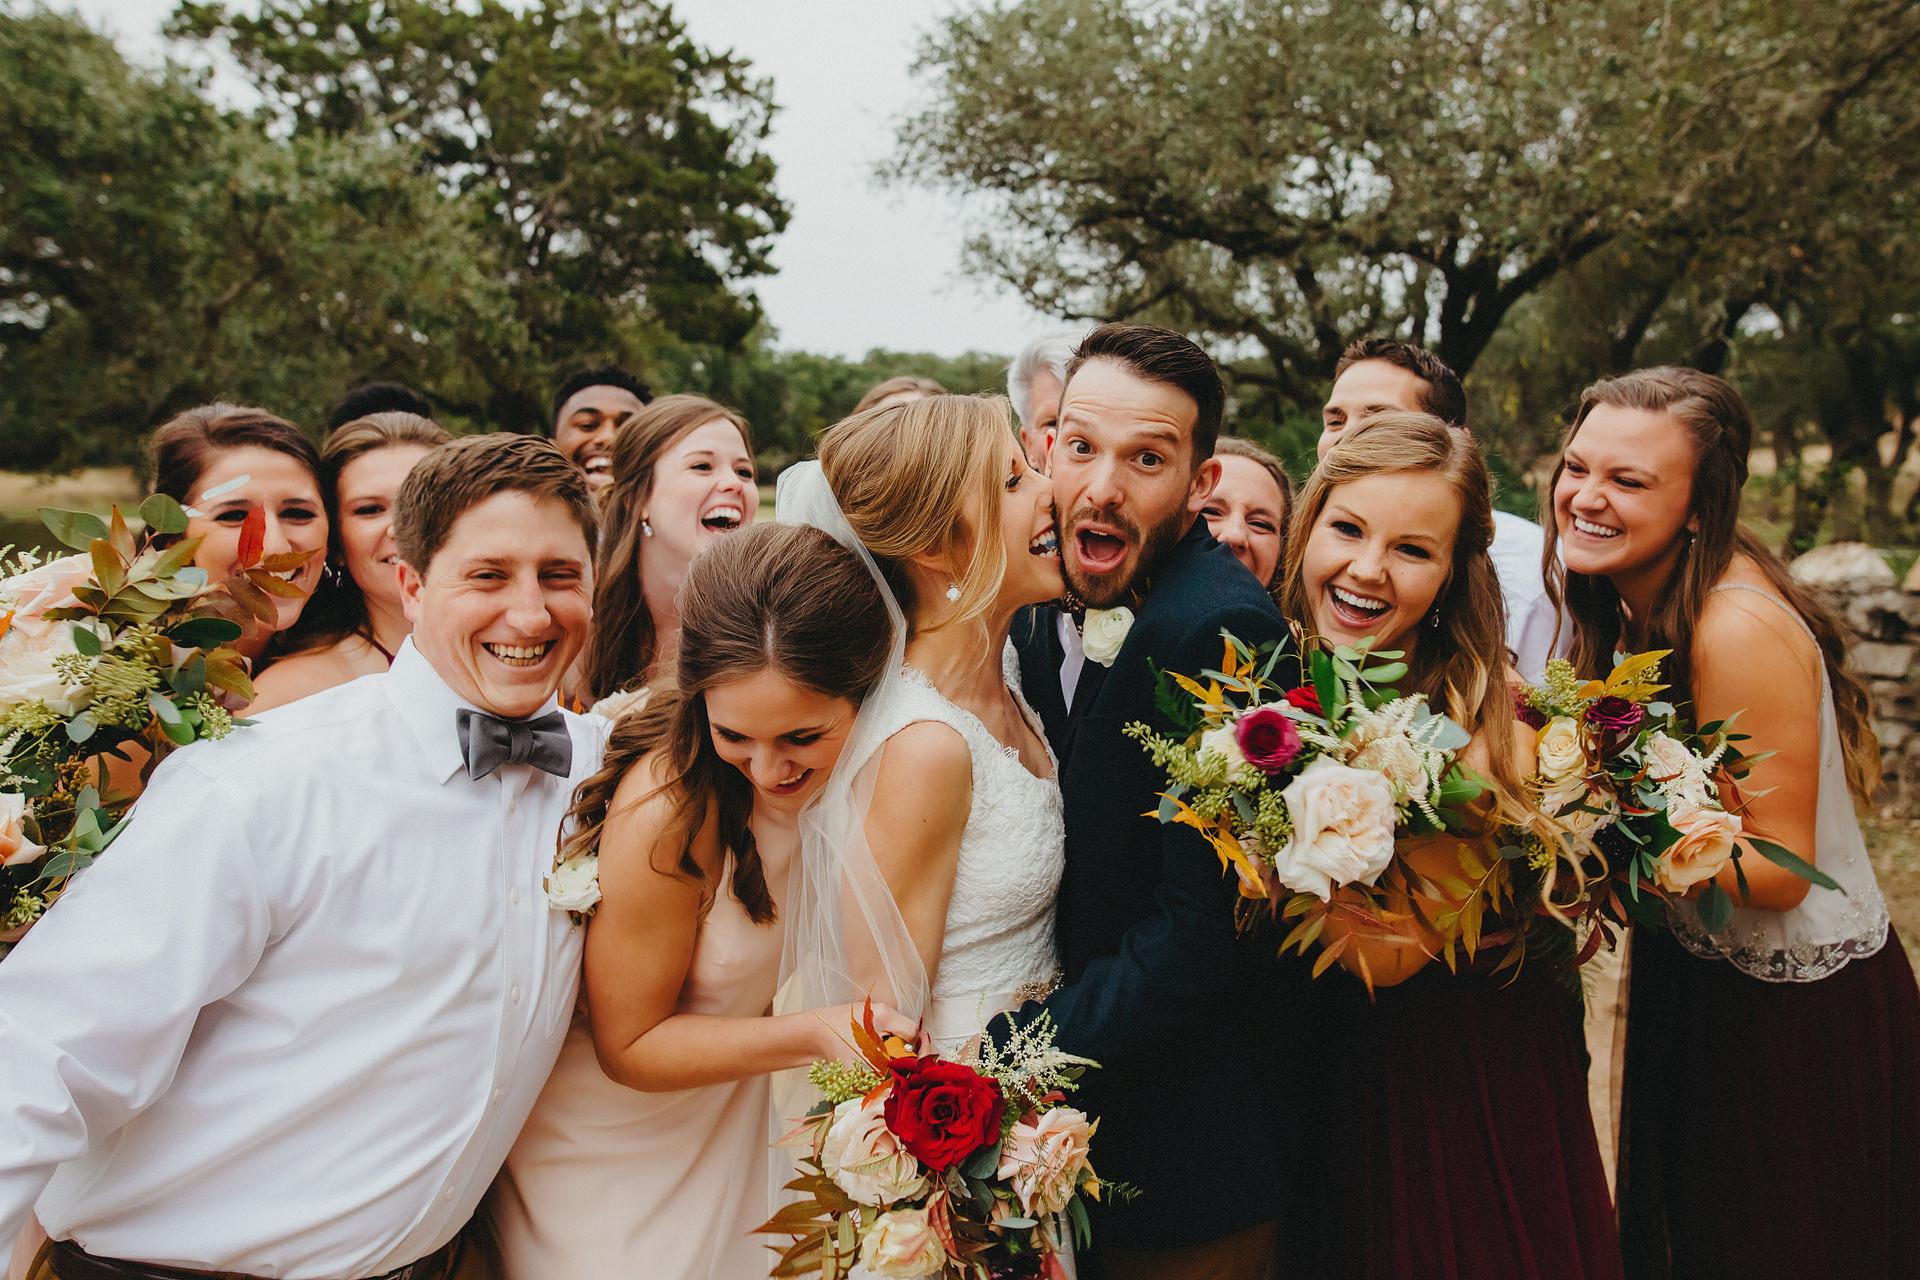 travis-hallmark-sarah-the-addison-grove-austin-wedding-photographers-00236.jpg